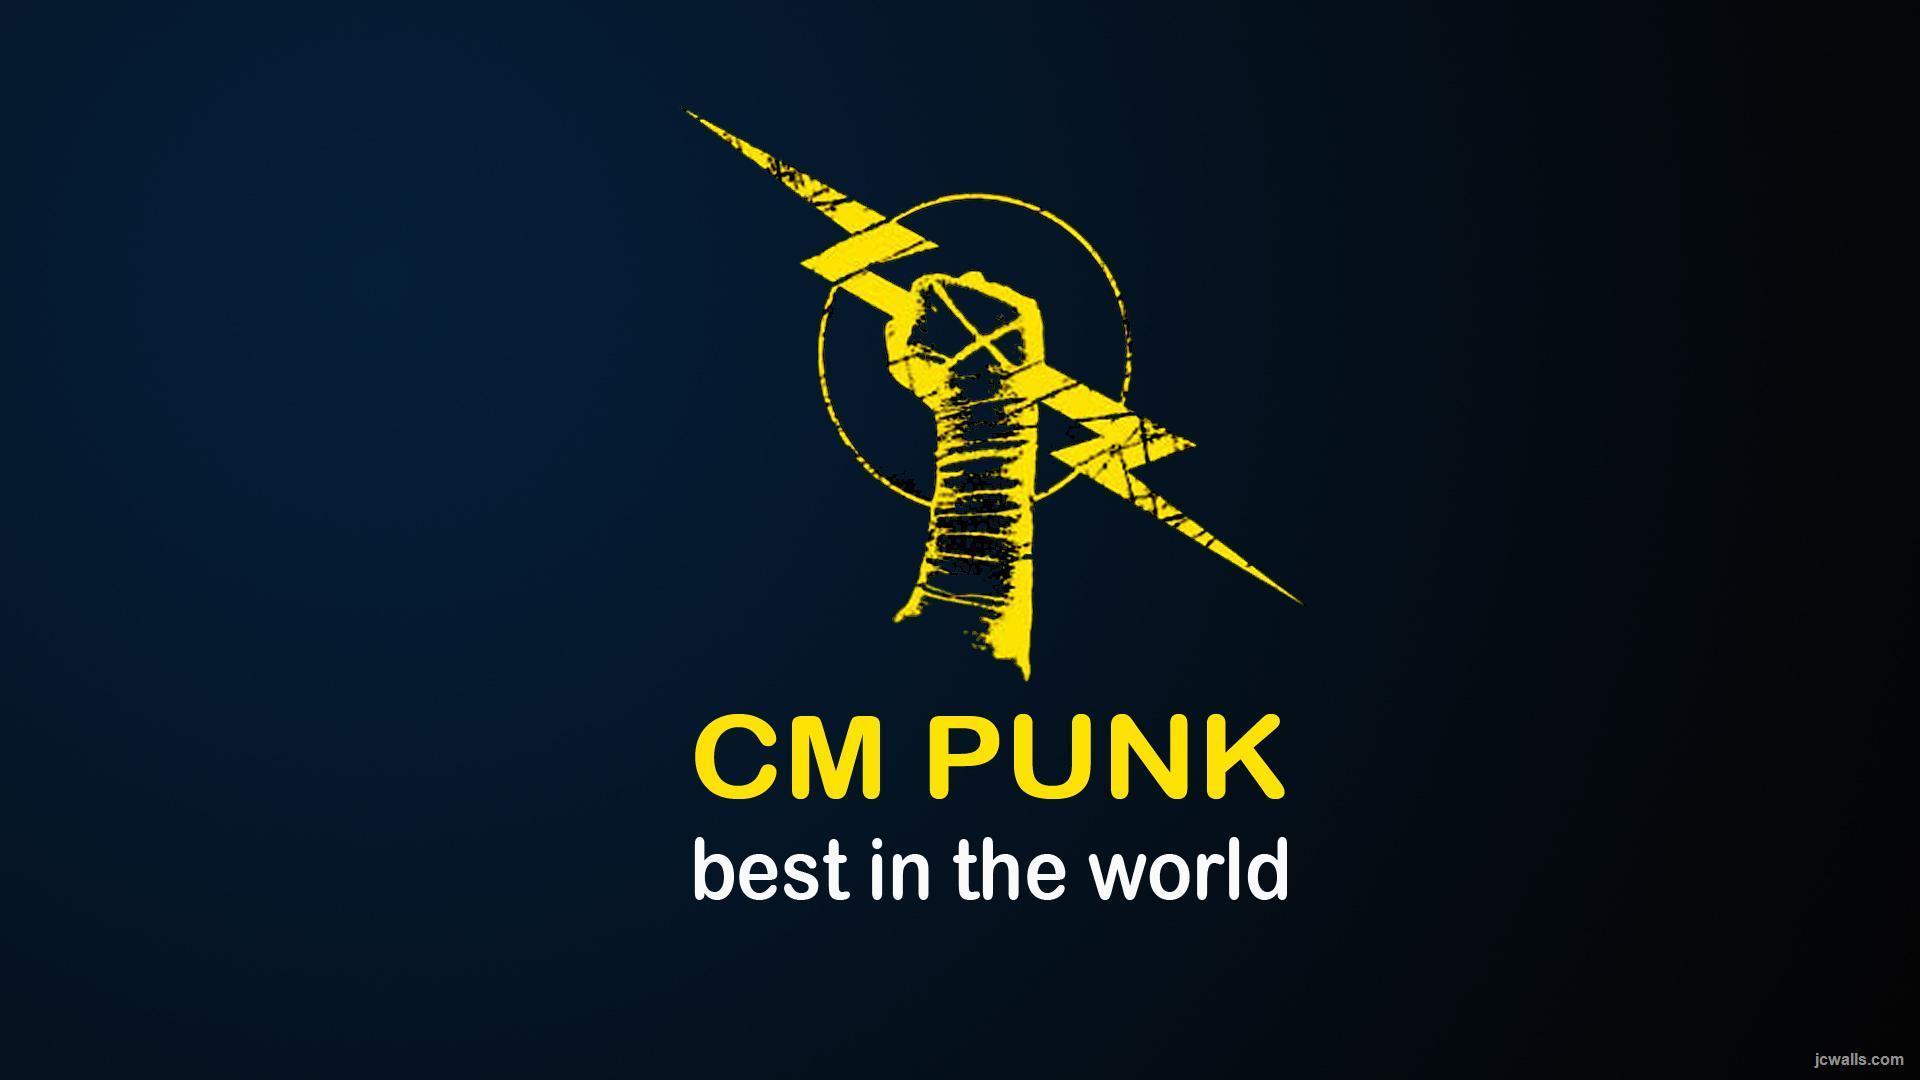 Cm Punk Logo Wallpapers Wallpaper Cave